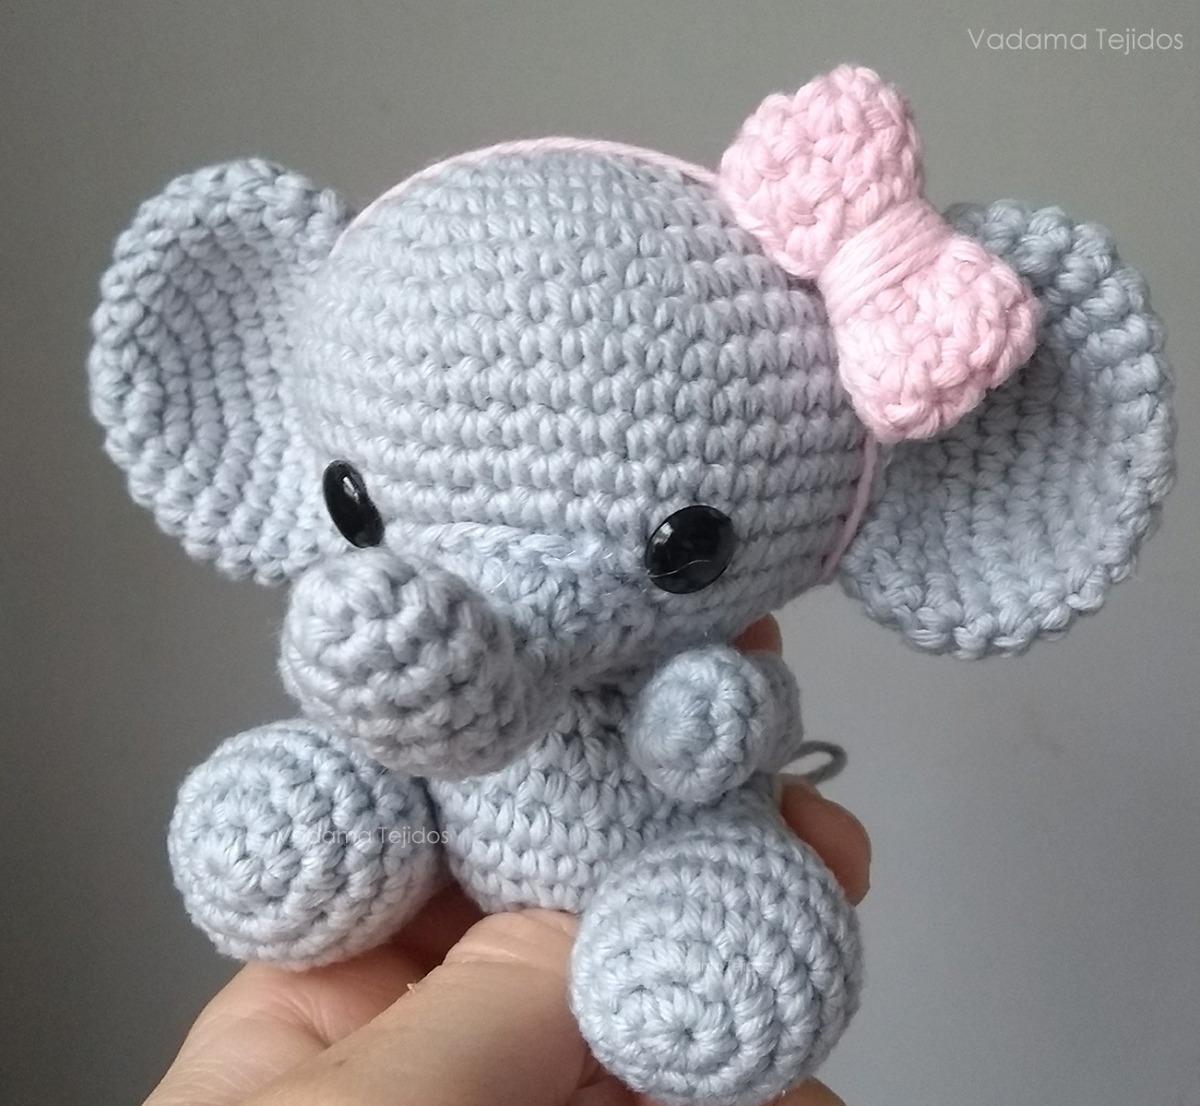 Elefante peluche, amigurumi de Two bee, patron gratis.Elephant ... | 1106x1200